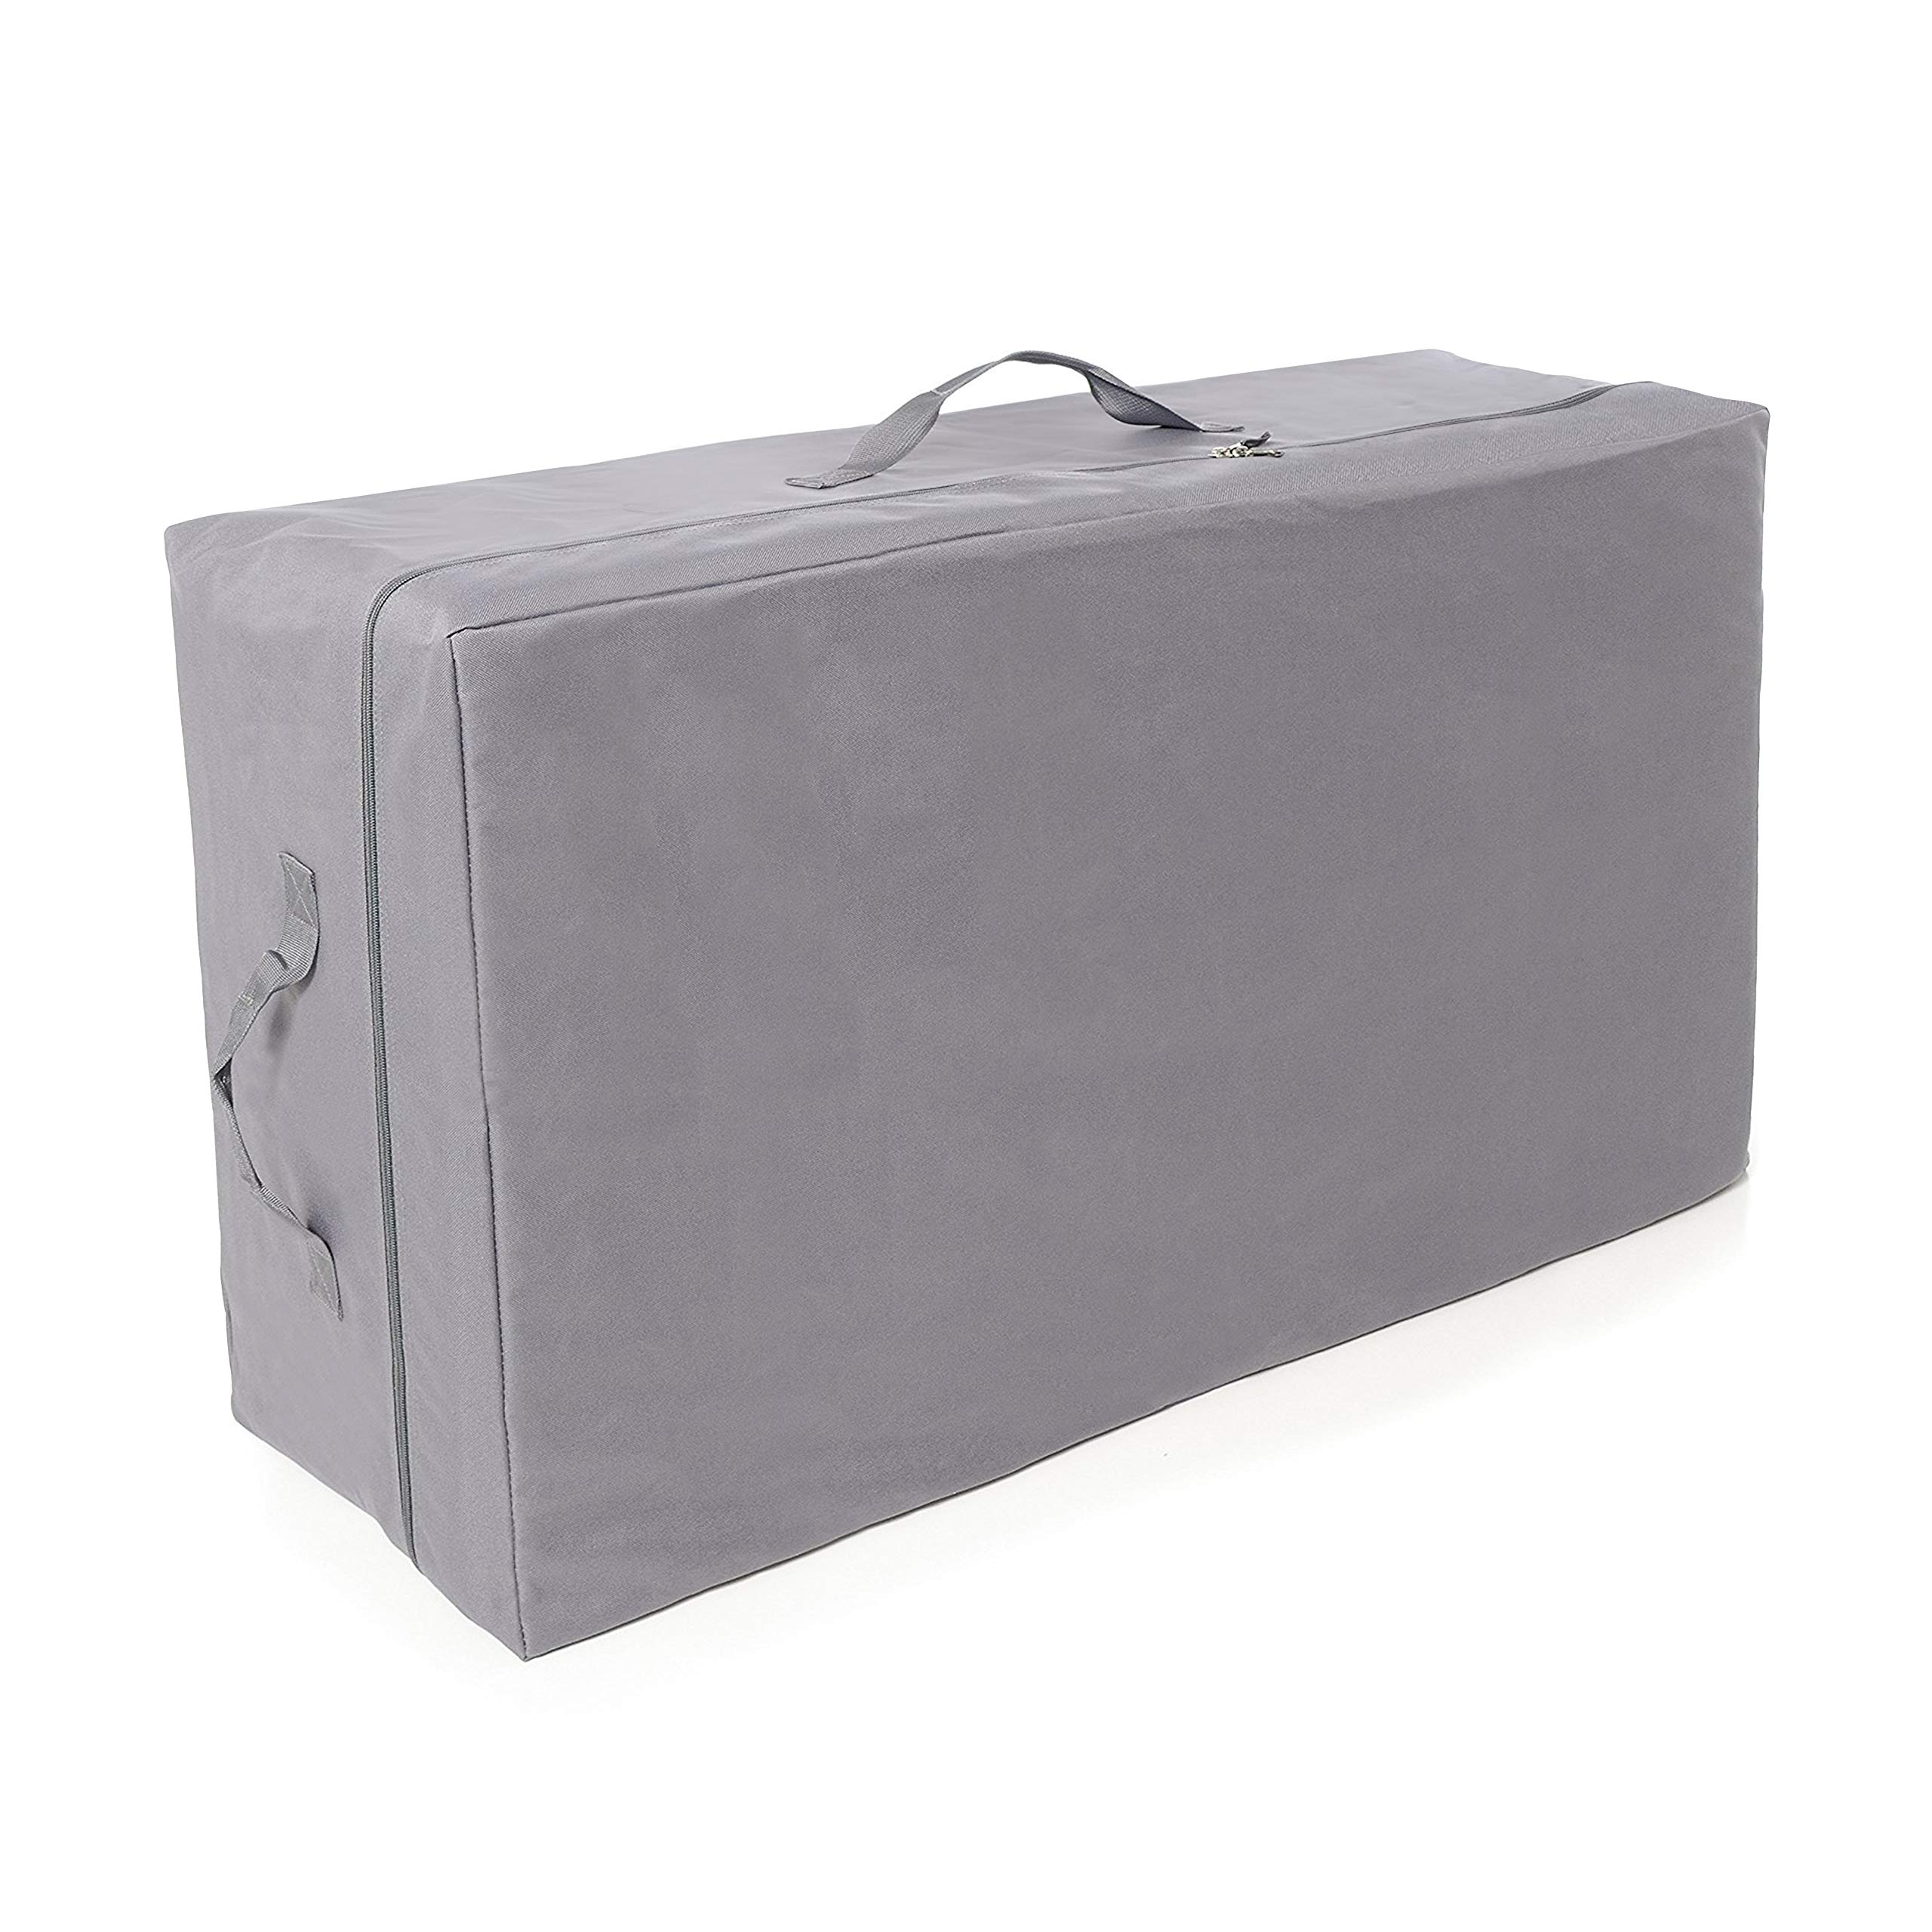 Carry Case for Milliard Tri-Fold Mattress (6 inch Full)